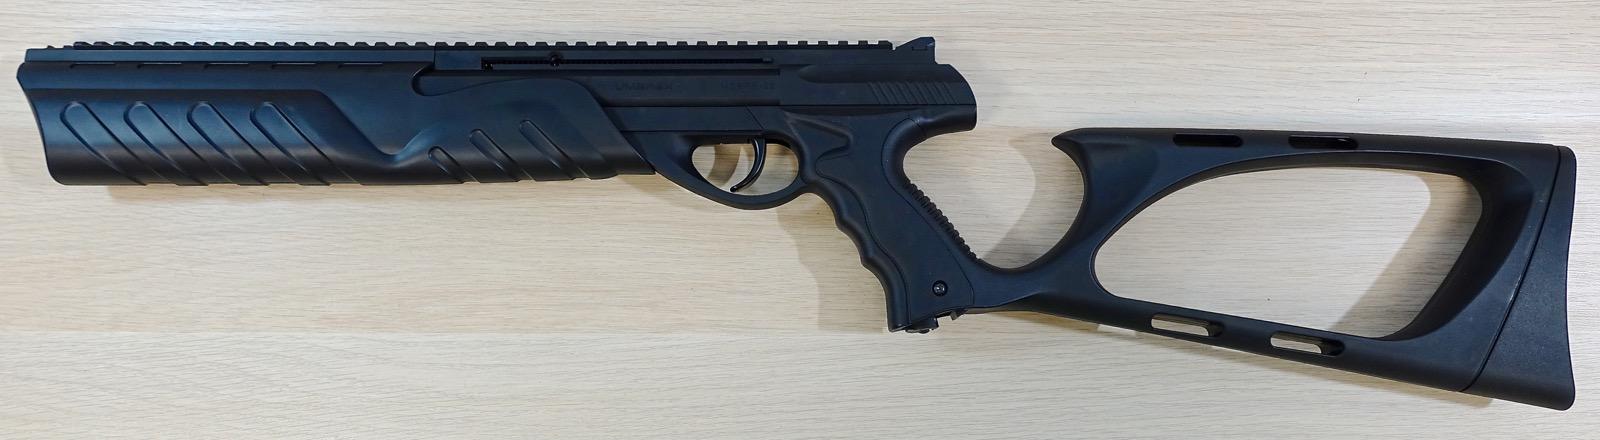 Umarex Morph 3X BB Gun Field Test Shooting Review — Replica Airguns